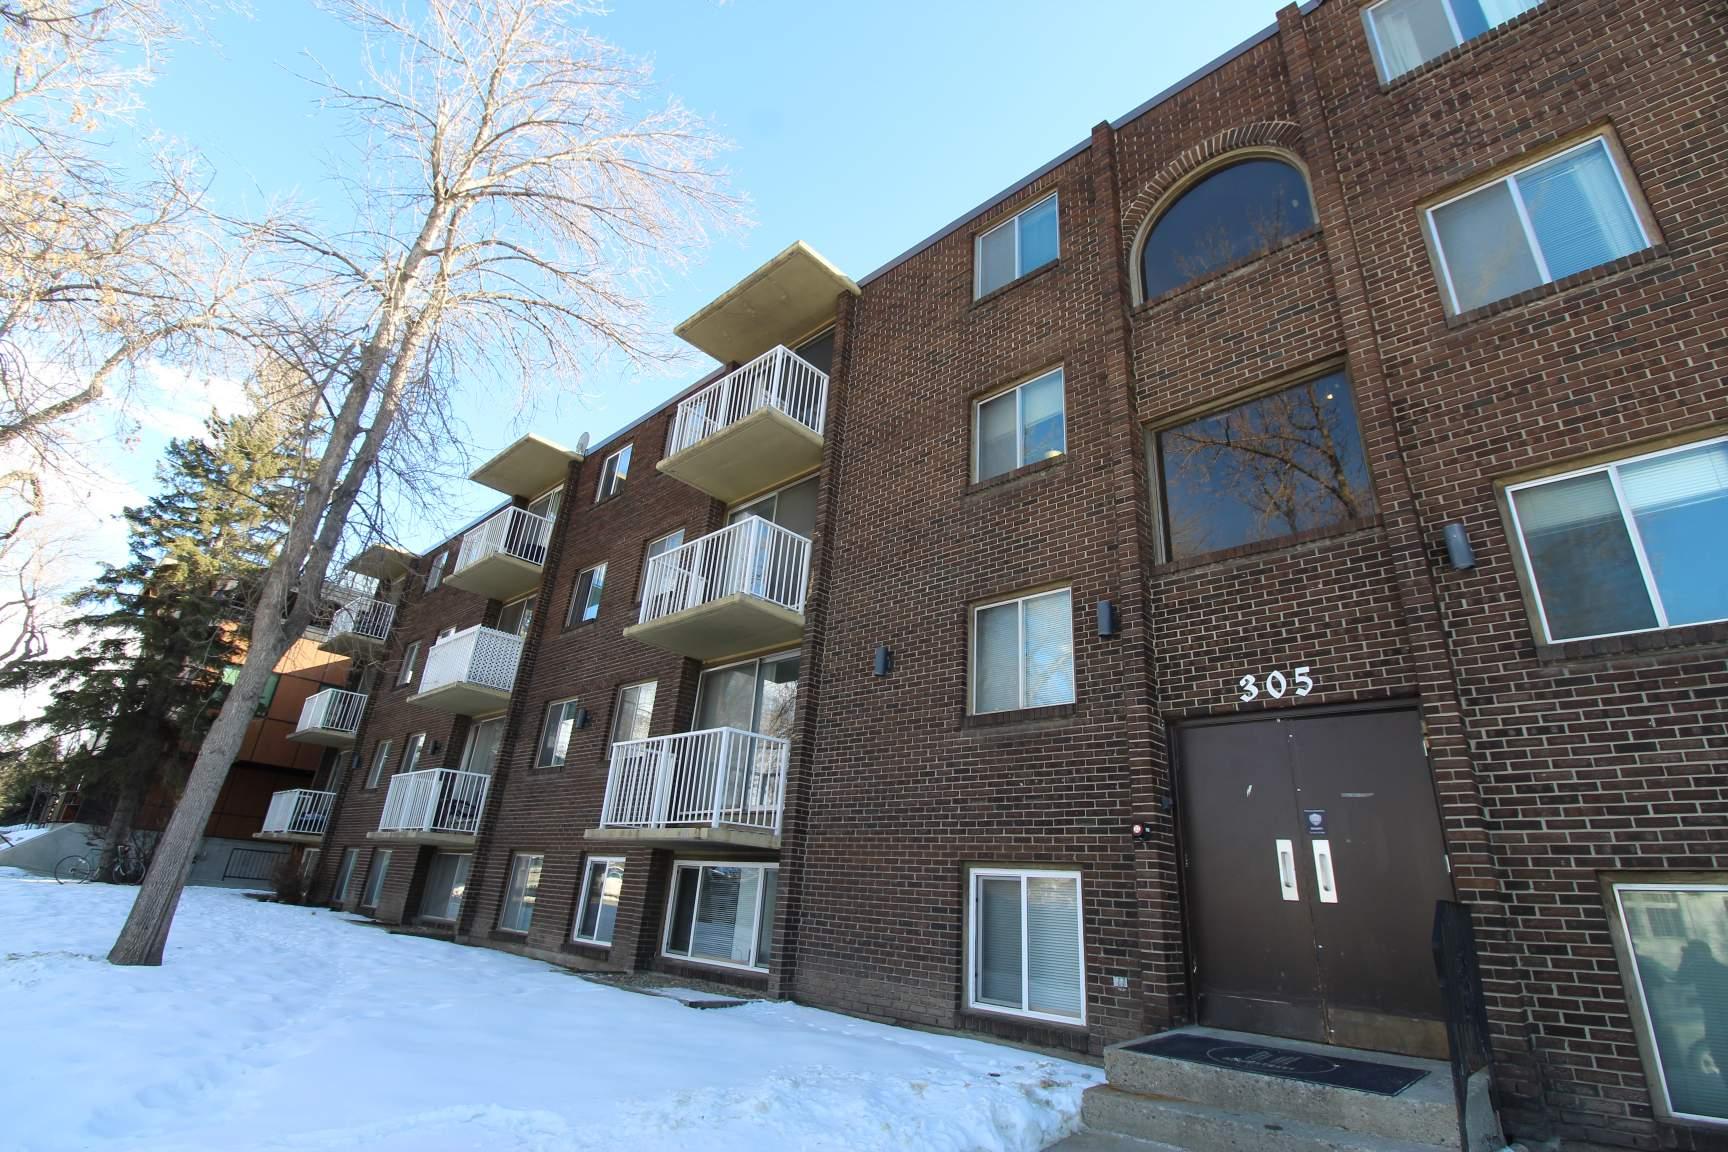 305 13 Avenue NE, Calgary, AB - $925 CAD/ month